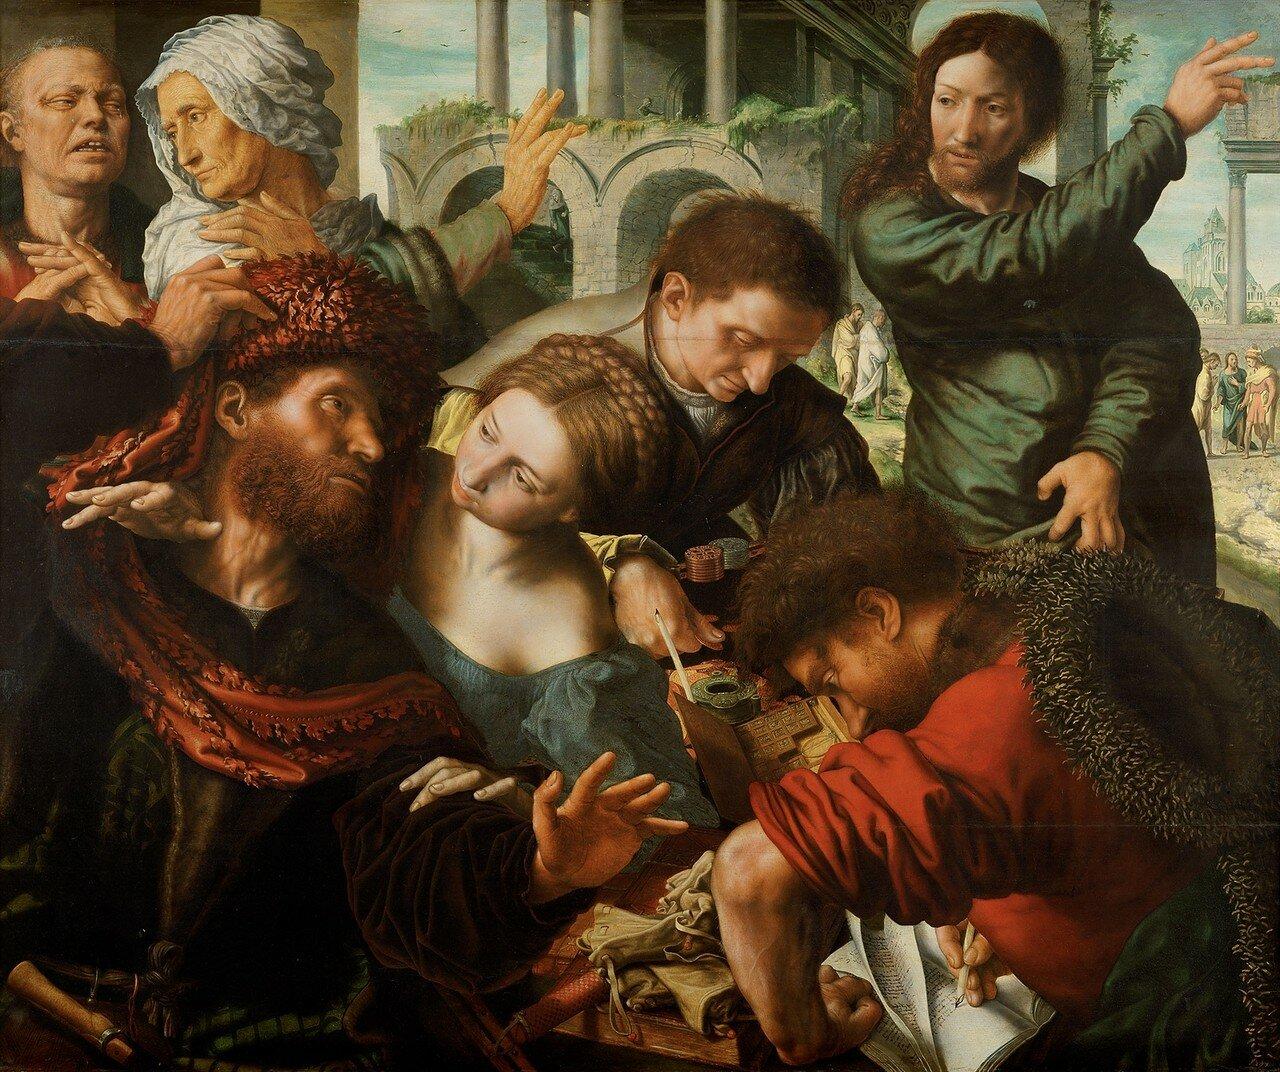 1548 (ок)_Призвание Матфея (The Calling of Matthew)_114 х 137_д.,м._Вена, Музей истории искусств..jpg